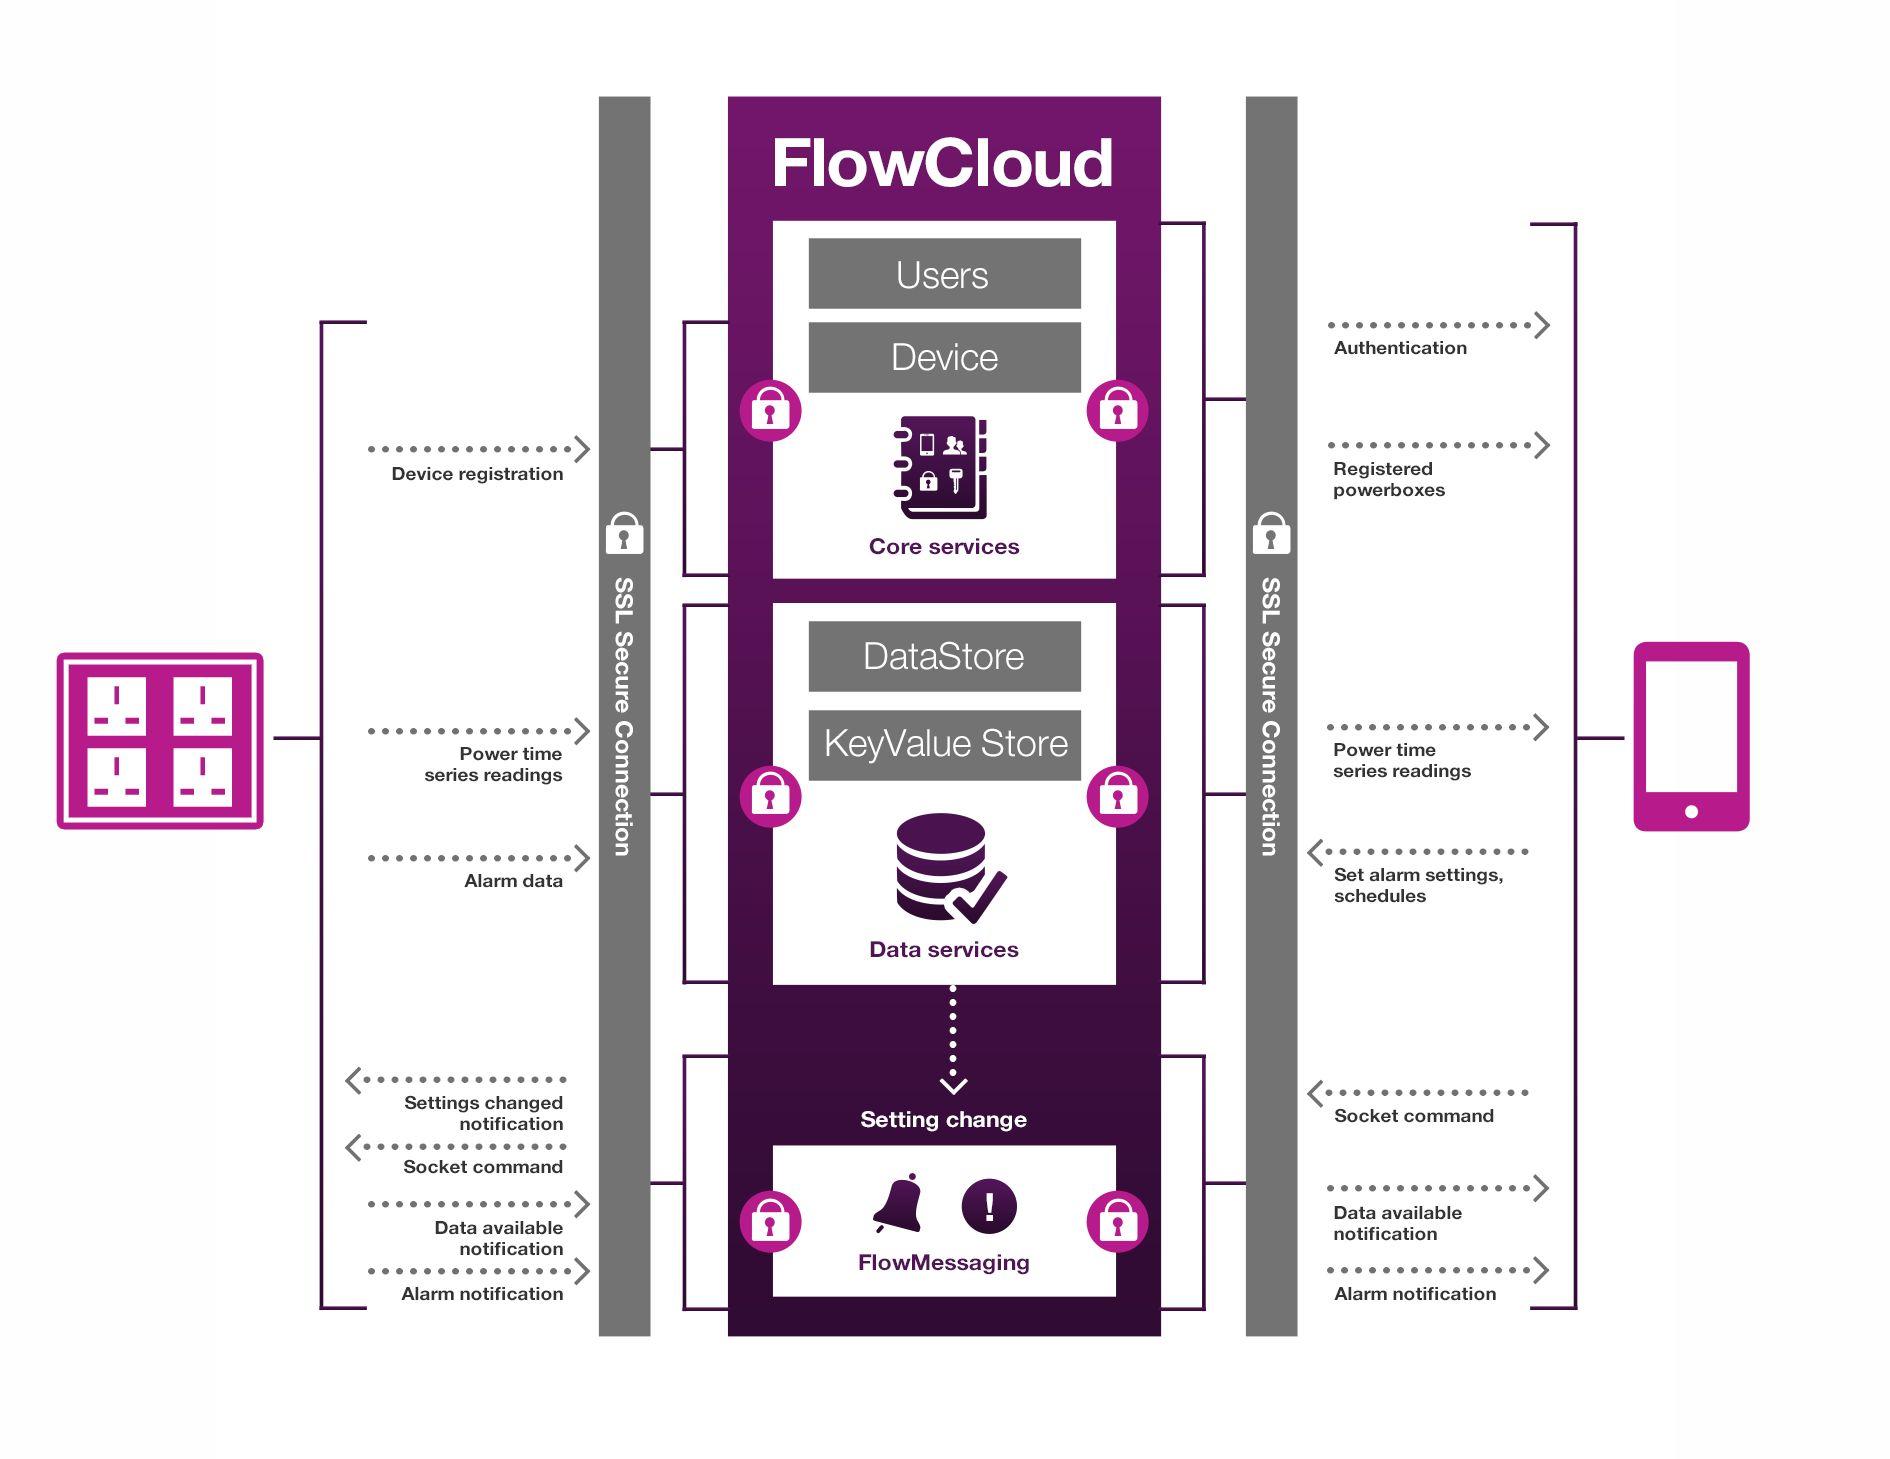 FlowCloud_PowerBox-diagram_Aug14